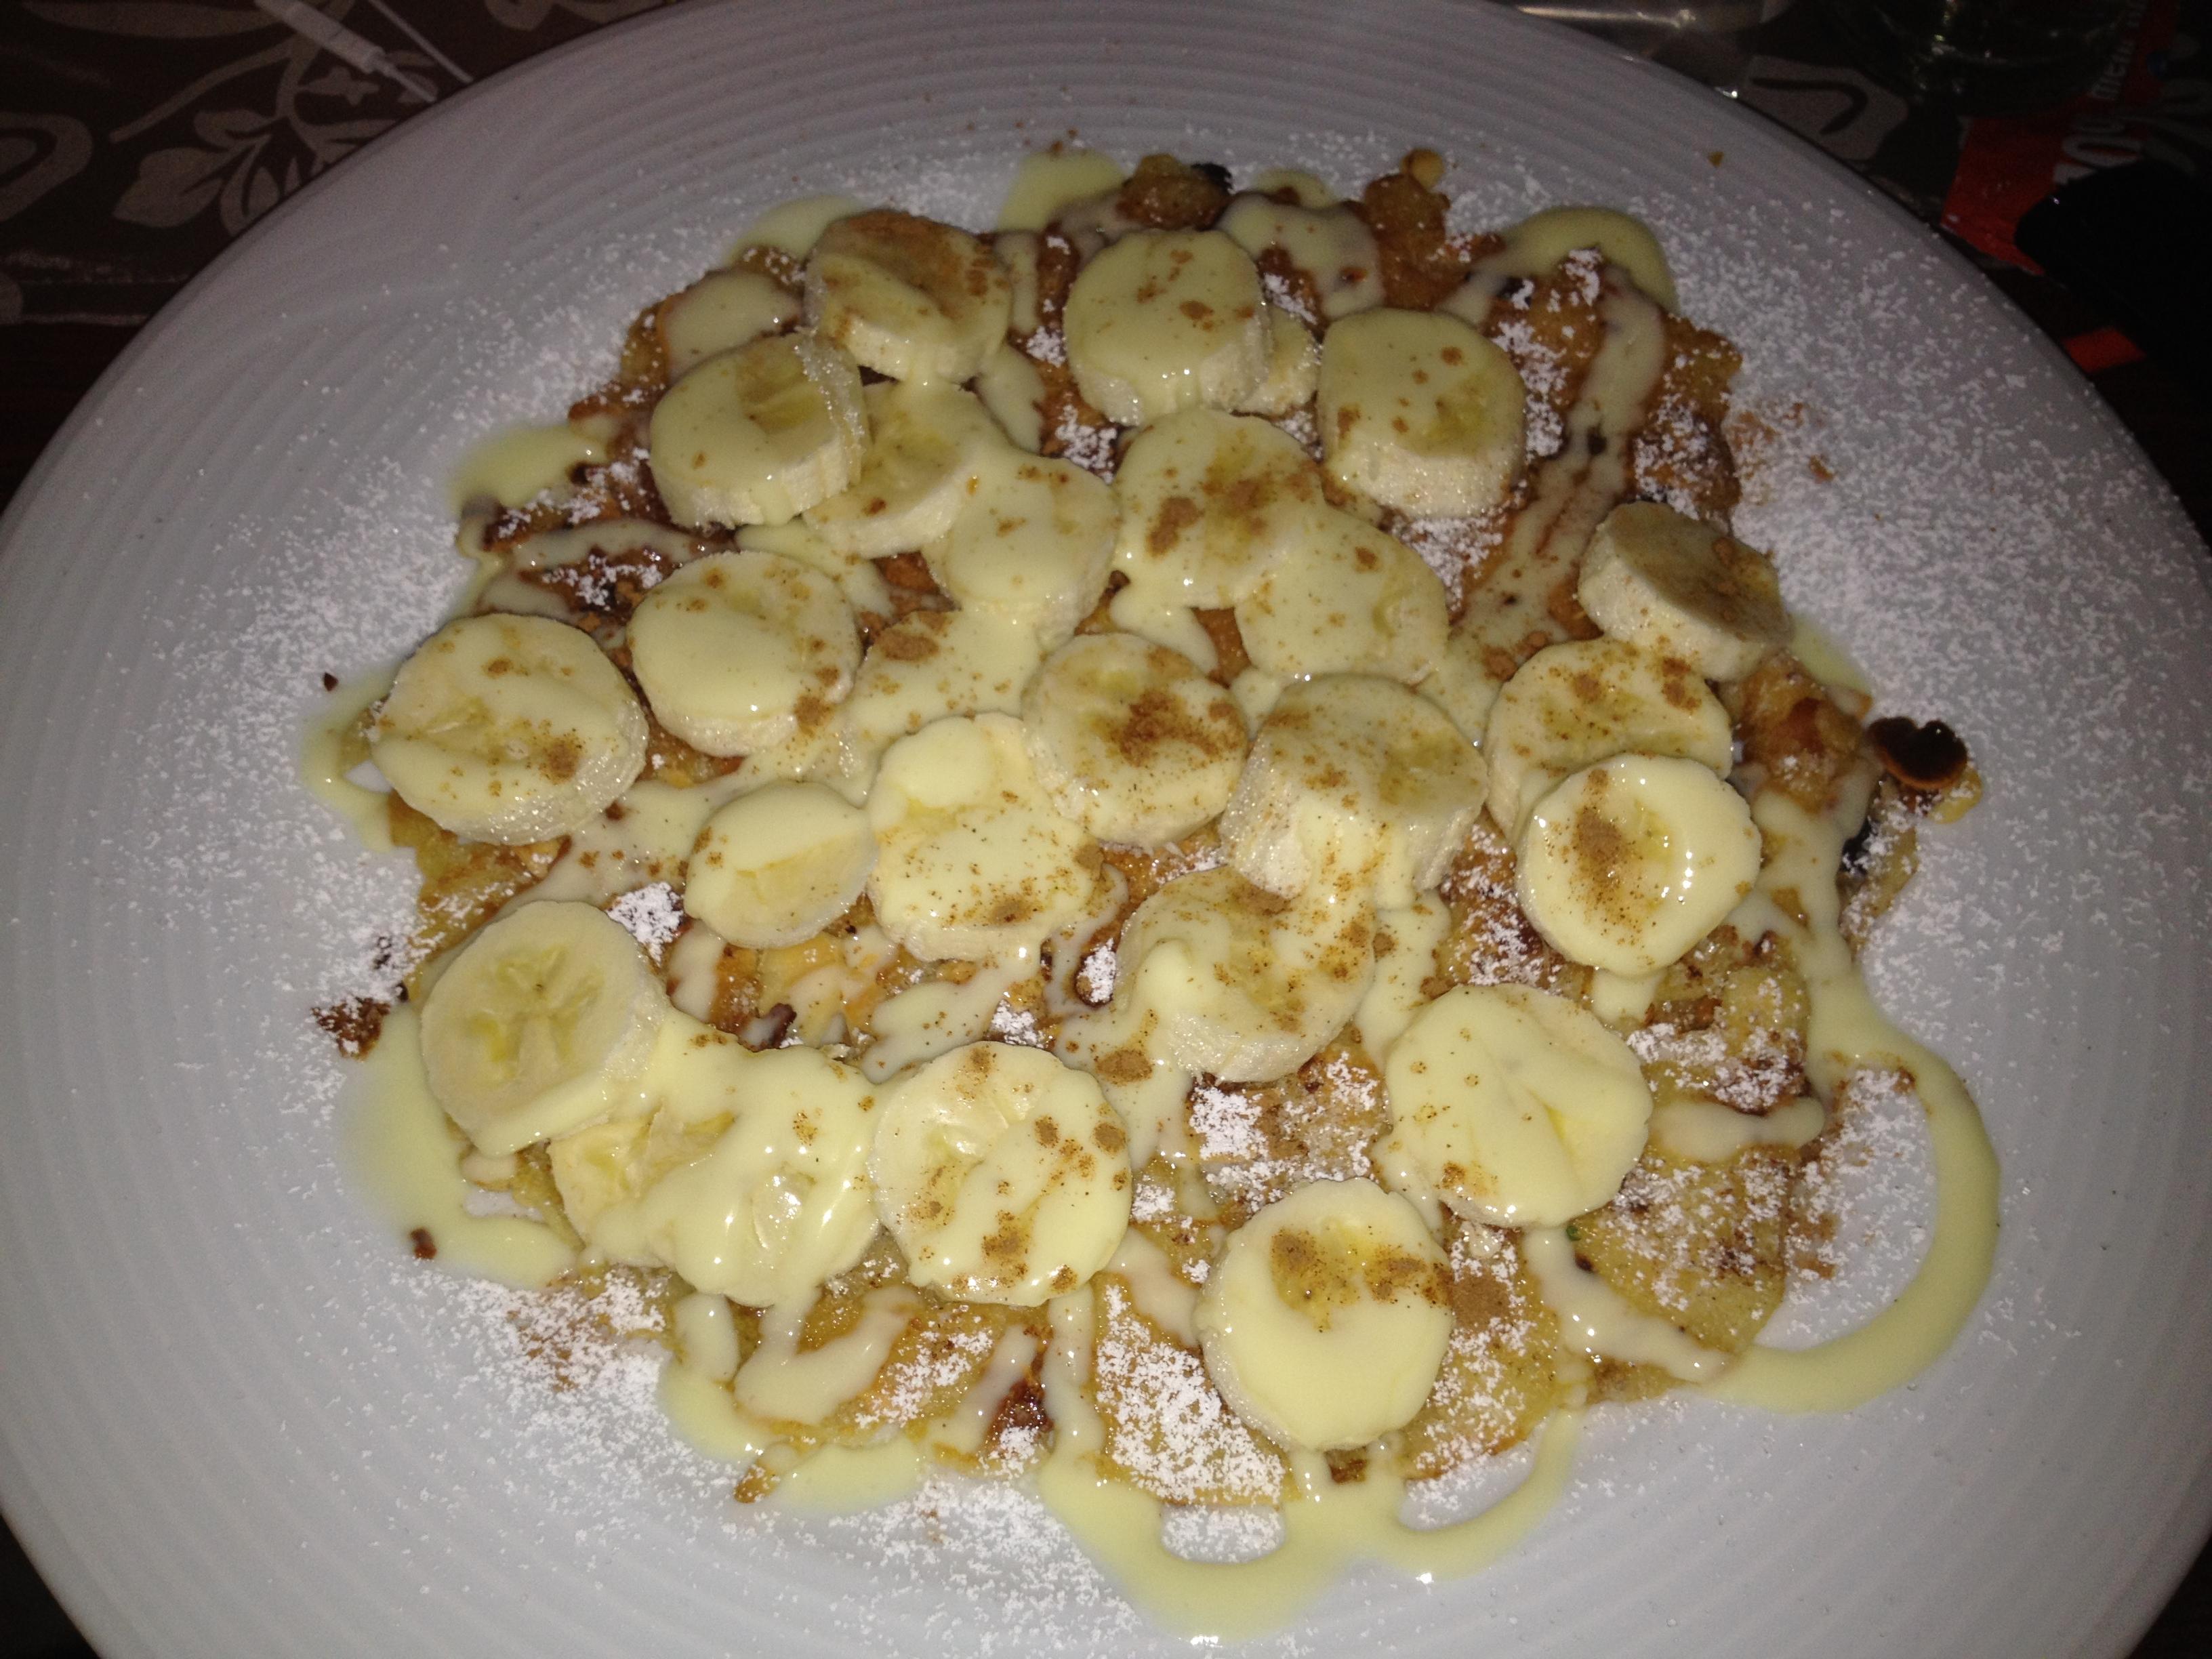 https://foodloader.net/ChilliN_2012-04-21_banana-a-la-vanille-pfannkuchen-zimt.jpg